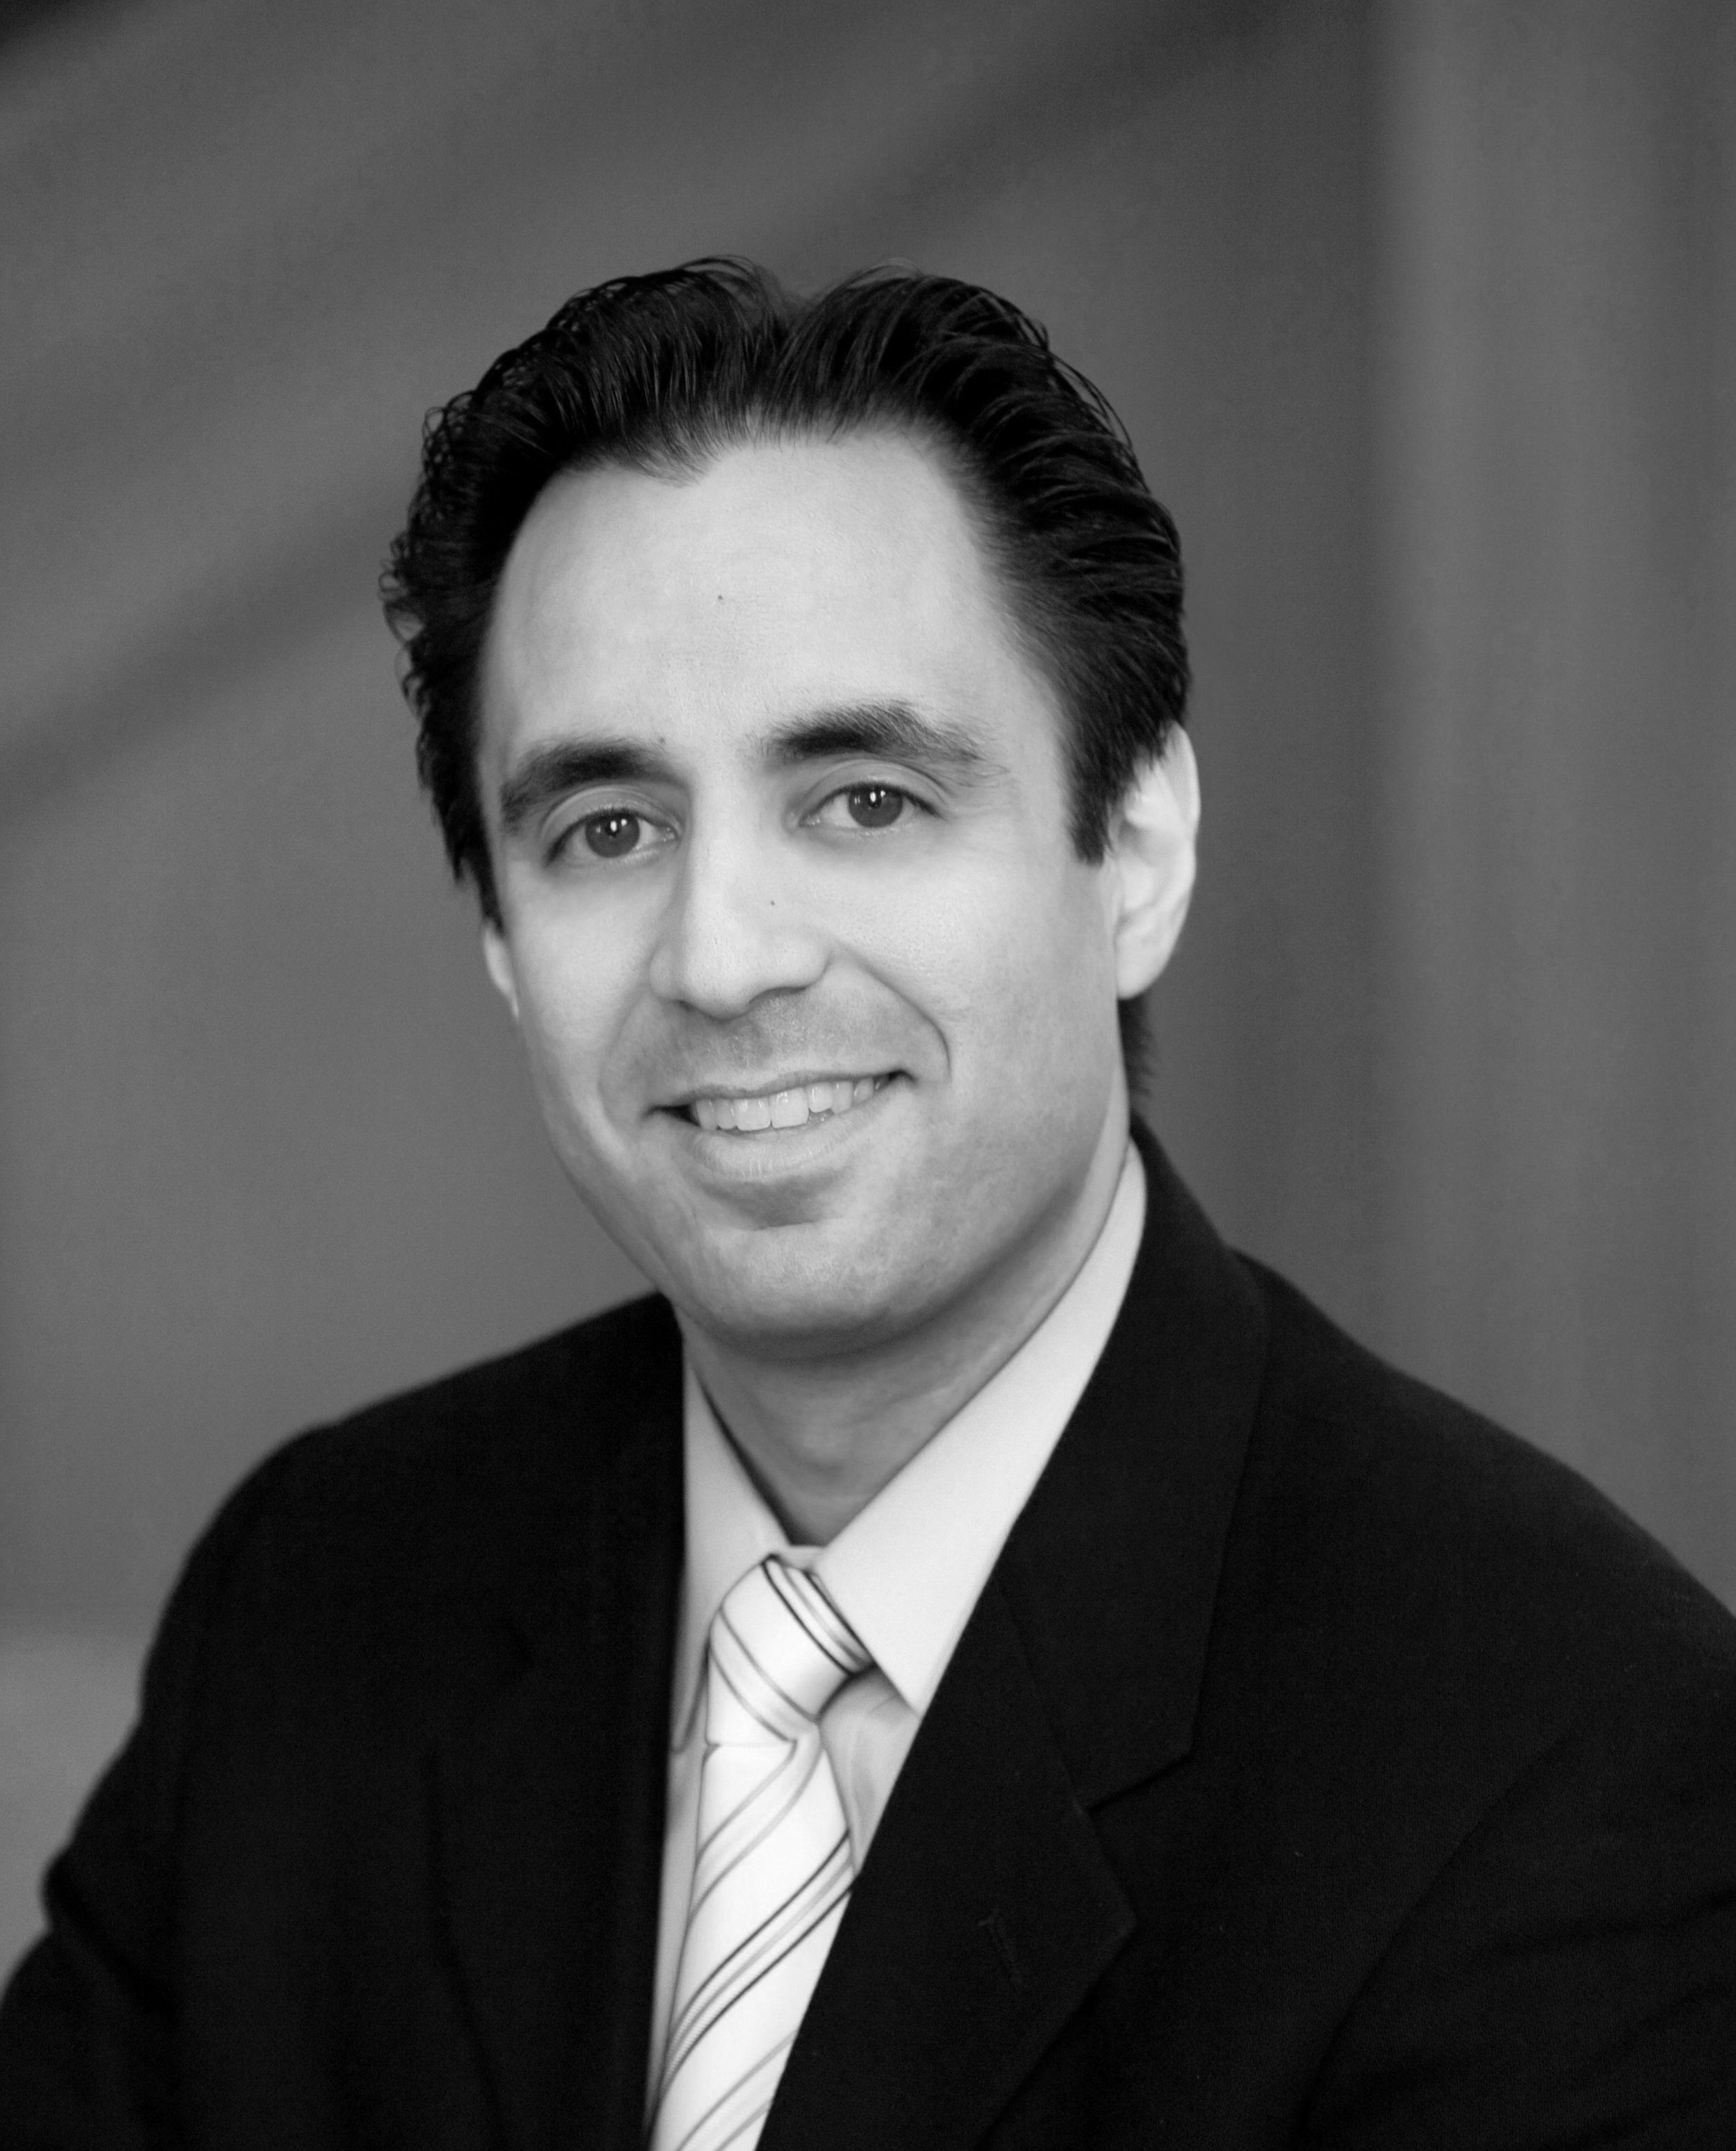 DEEPAK MALHOTRA | PROFESSOR OF BUSINESS ADMINISTRATION, HARVARD BUSINESS SCHOOL